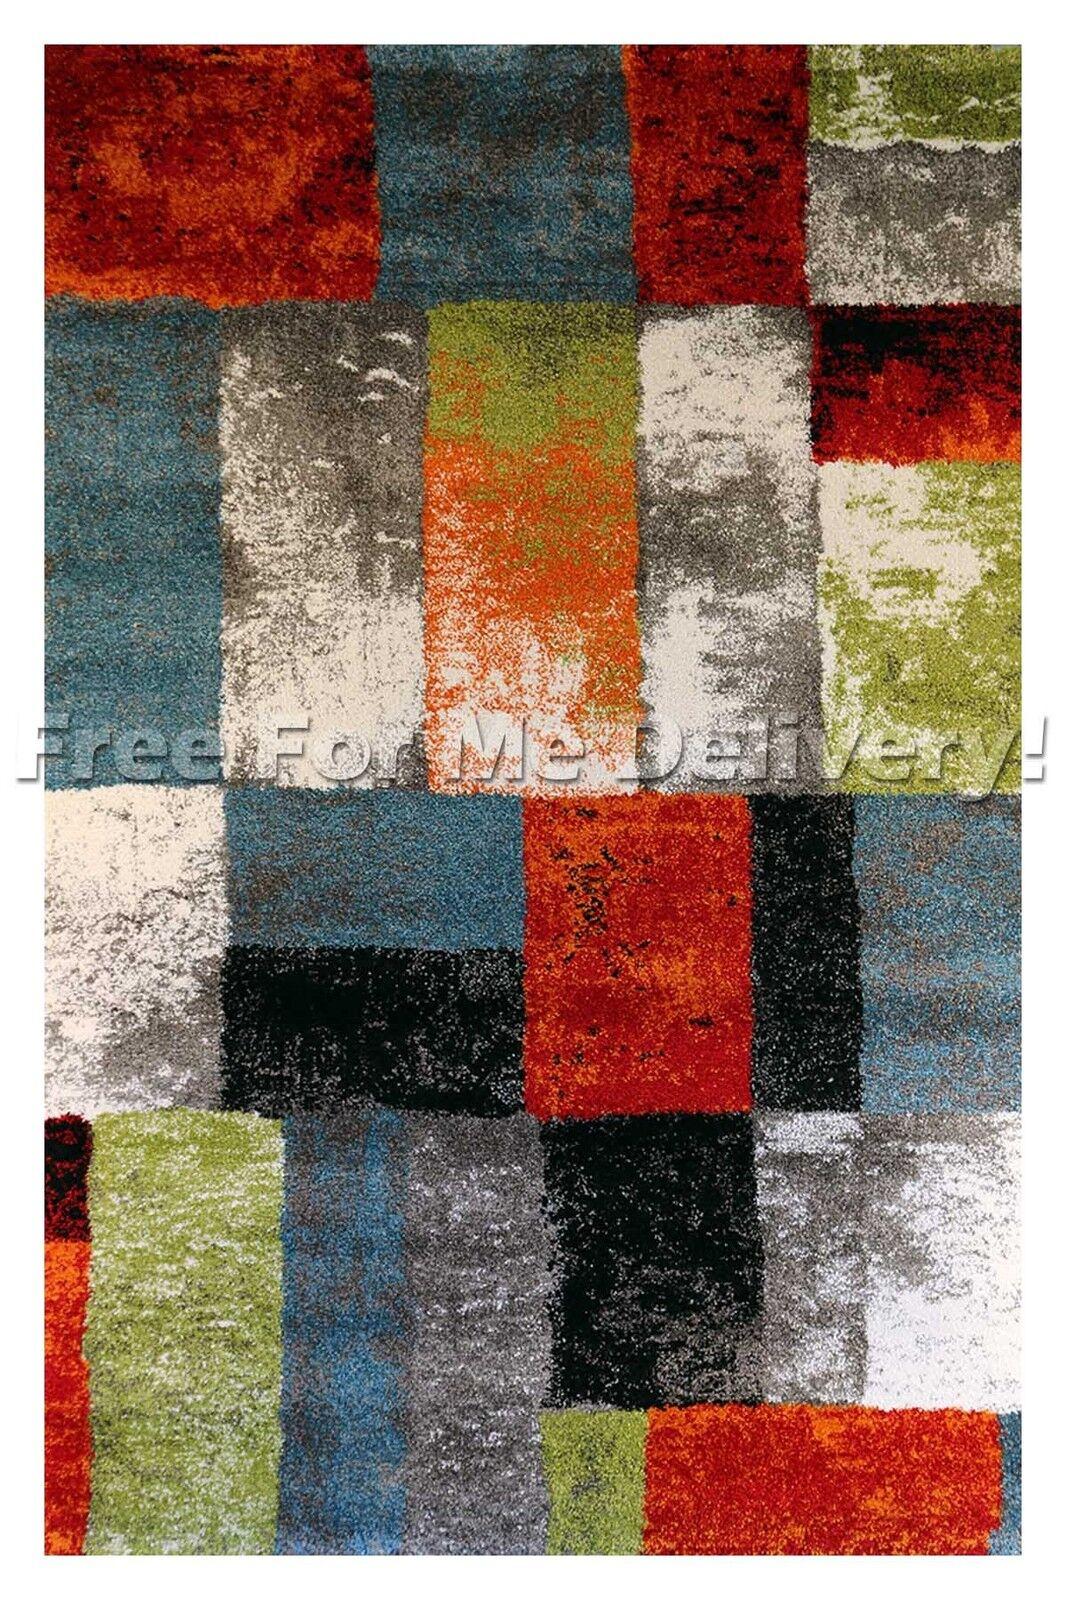 BOCA GRUNGE STYLE MULTI MODERN FLOOR RUG (XS) 80x150cm FREE DELIVERY